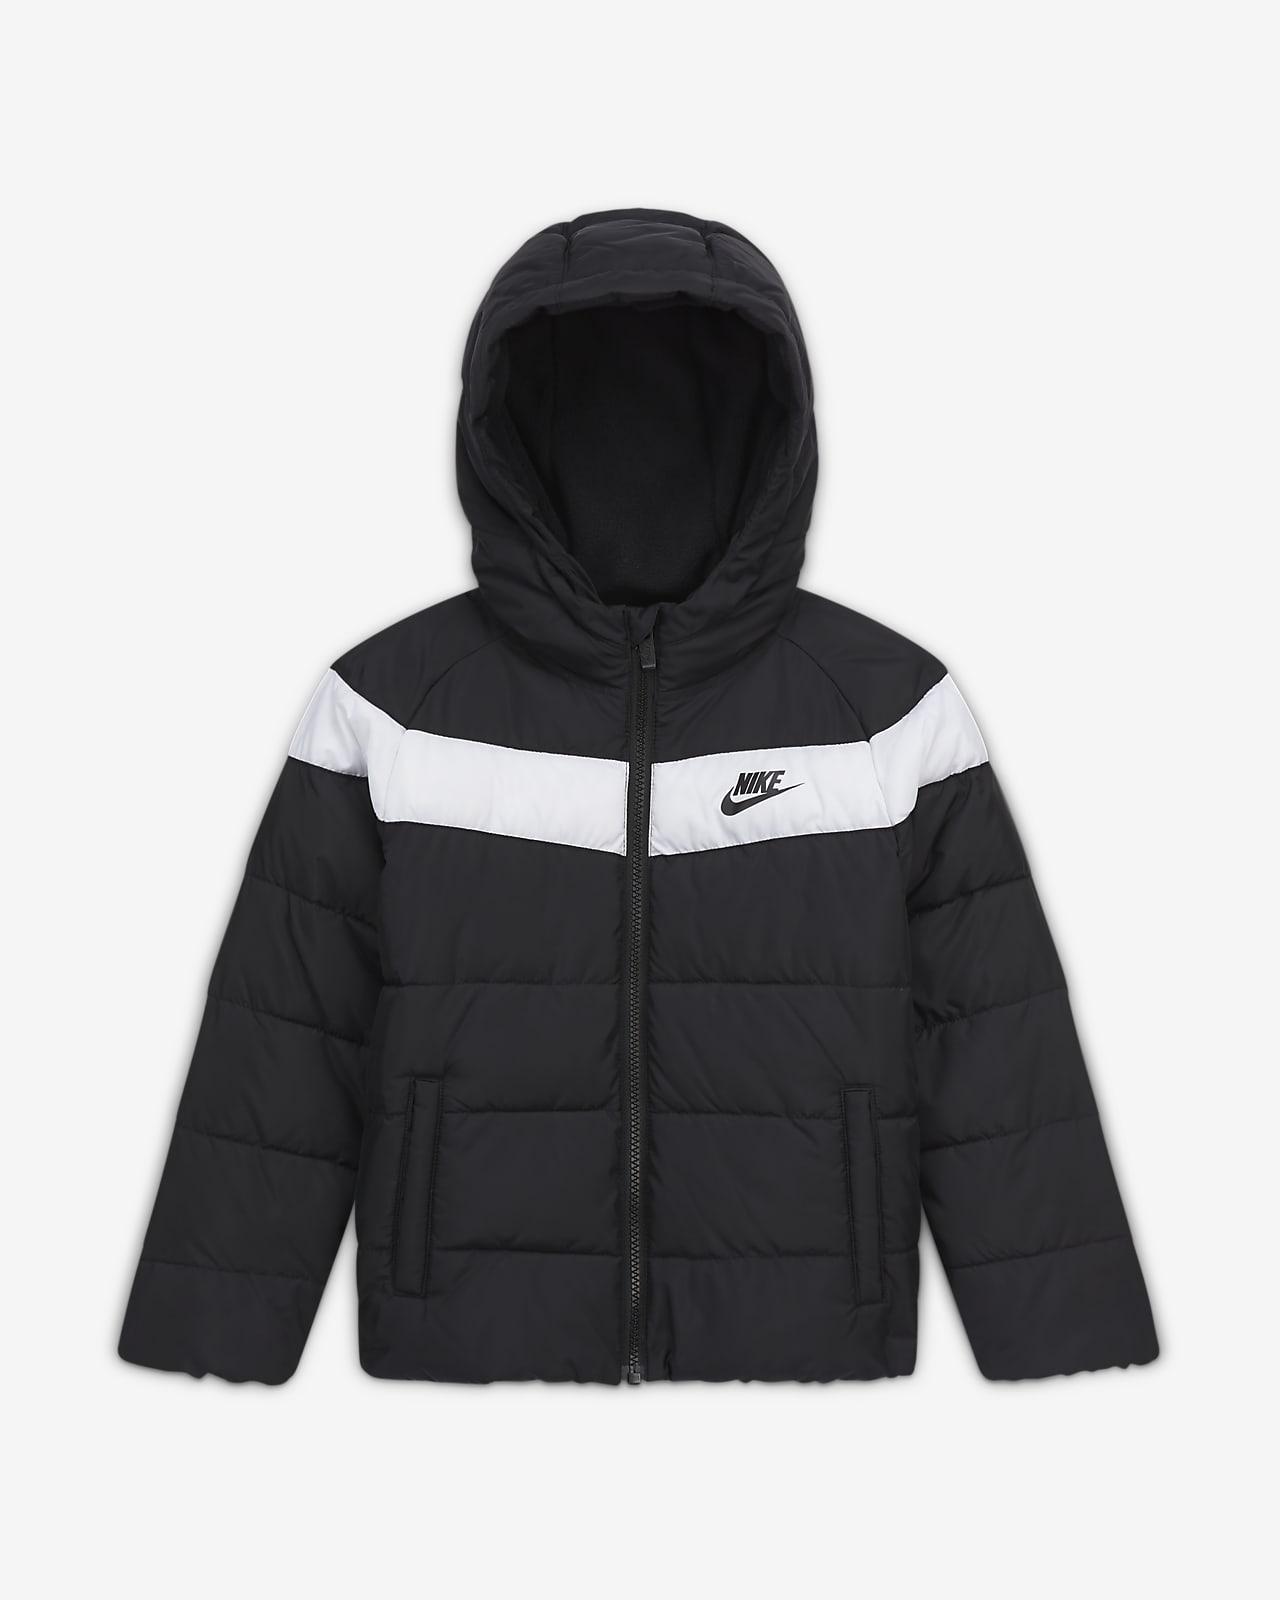 Nike Puffer-Jacke für jüngere Kinder